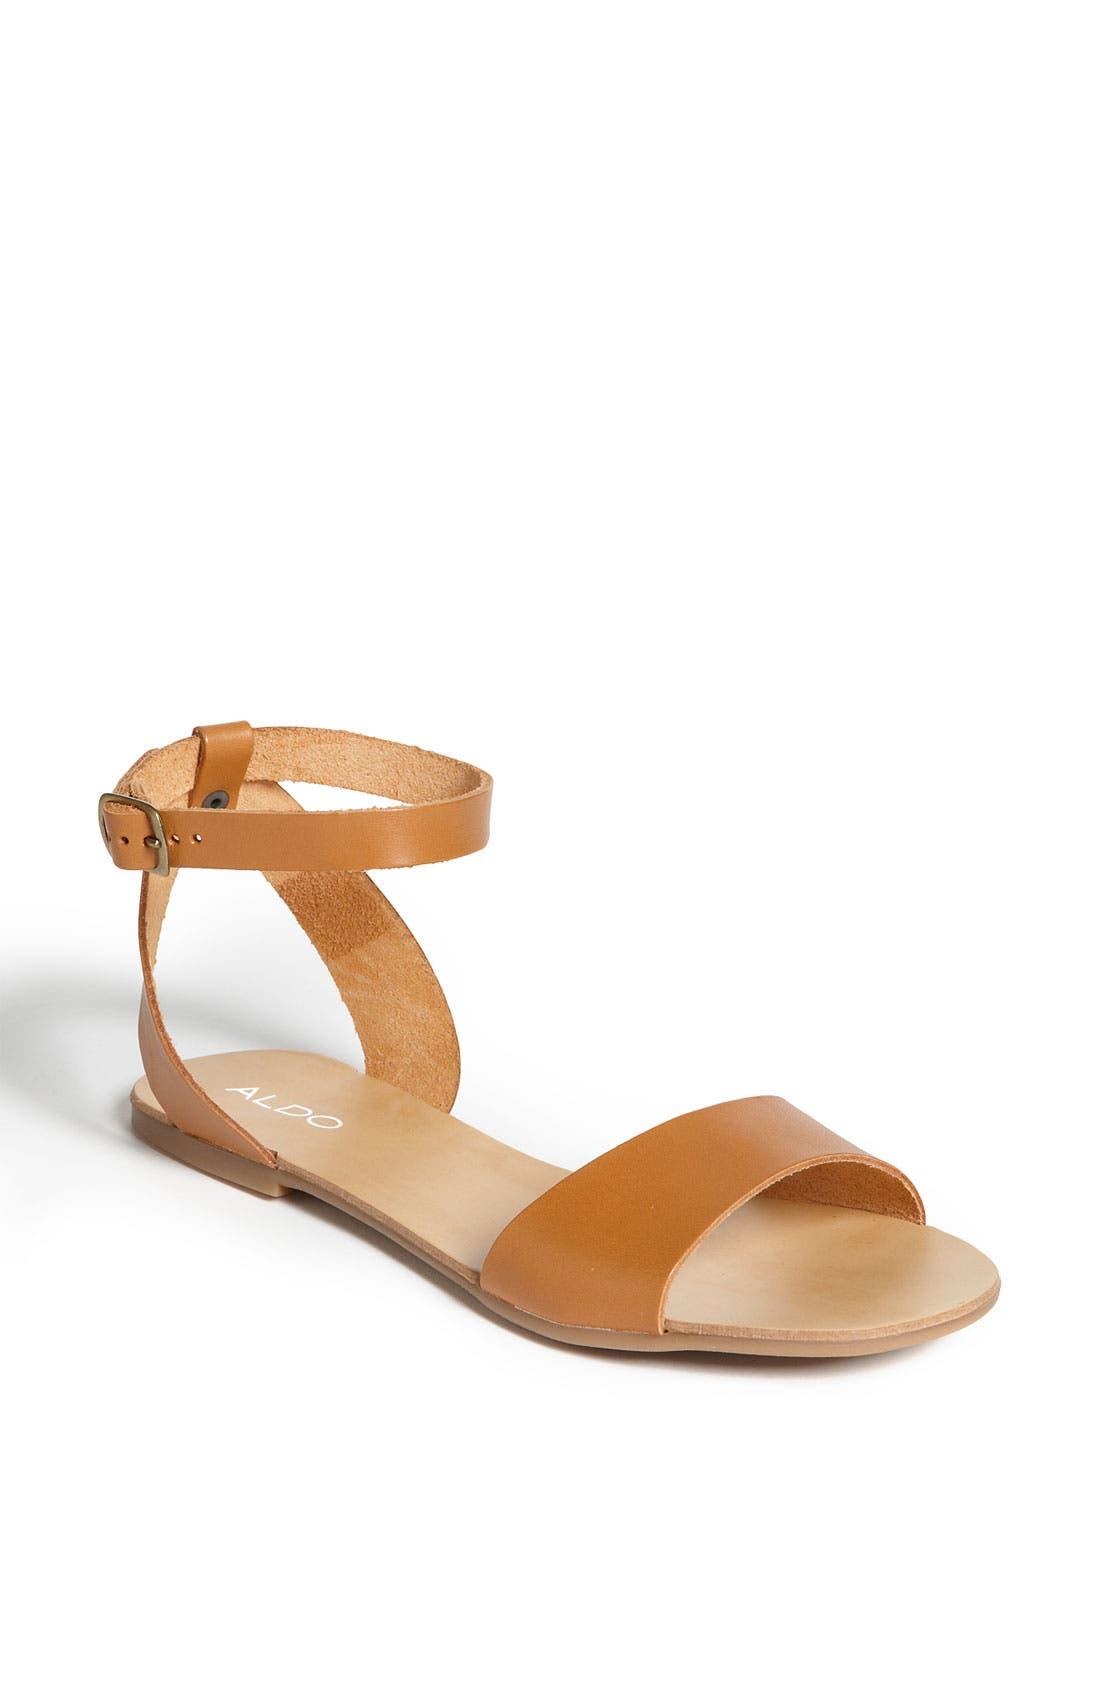 Main Image - ALDO 'Brendle' Sandal